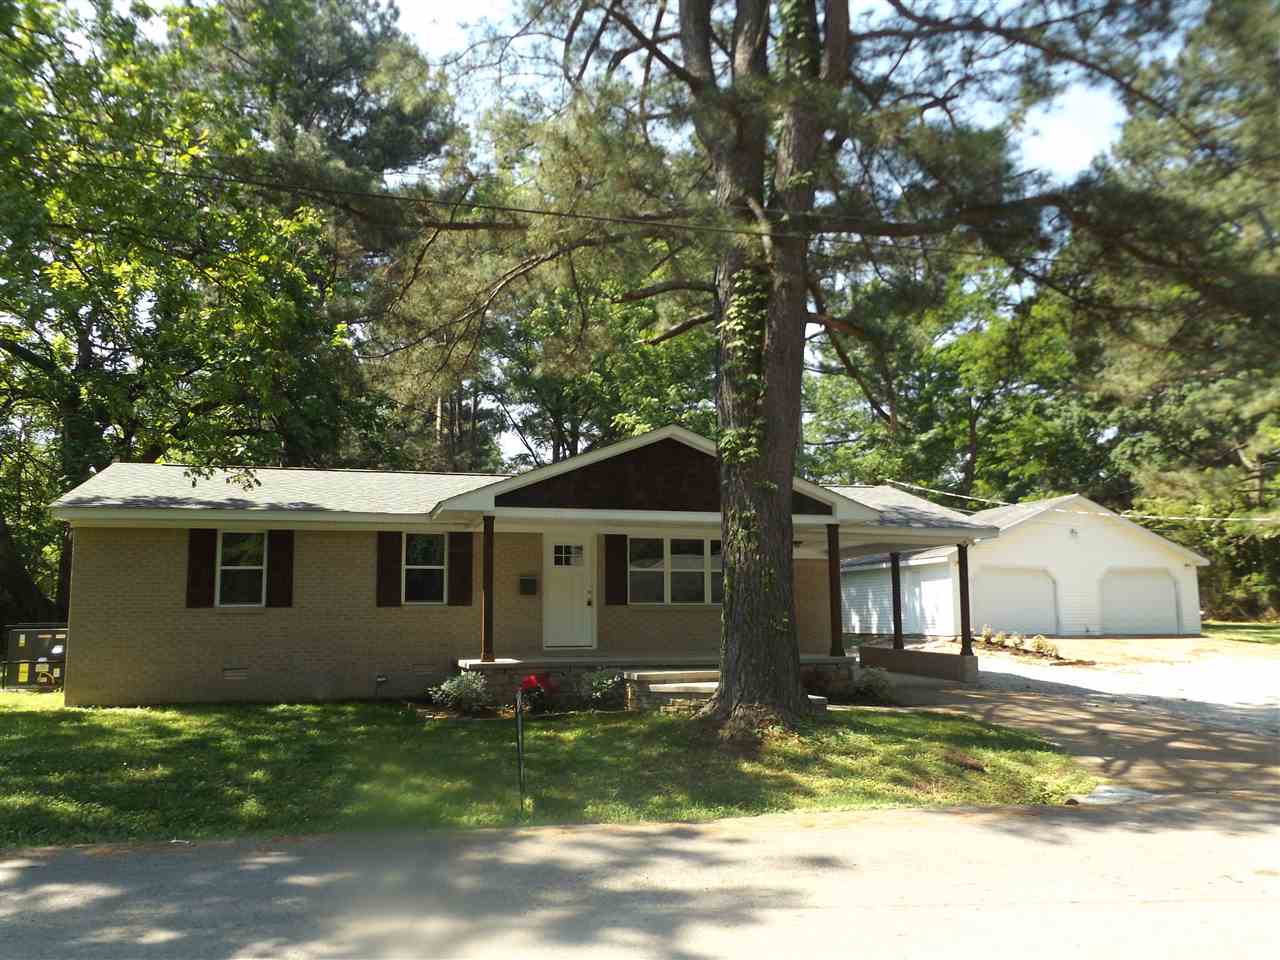 105 Johnson Somerville, TN 38068 - MLS #: 10027116